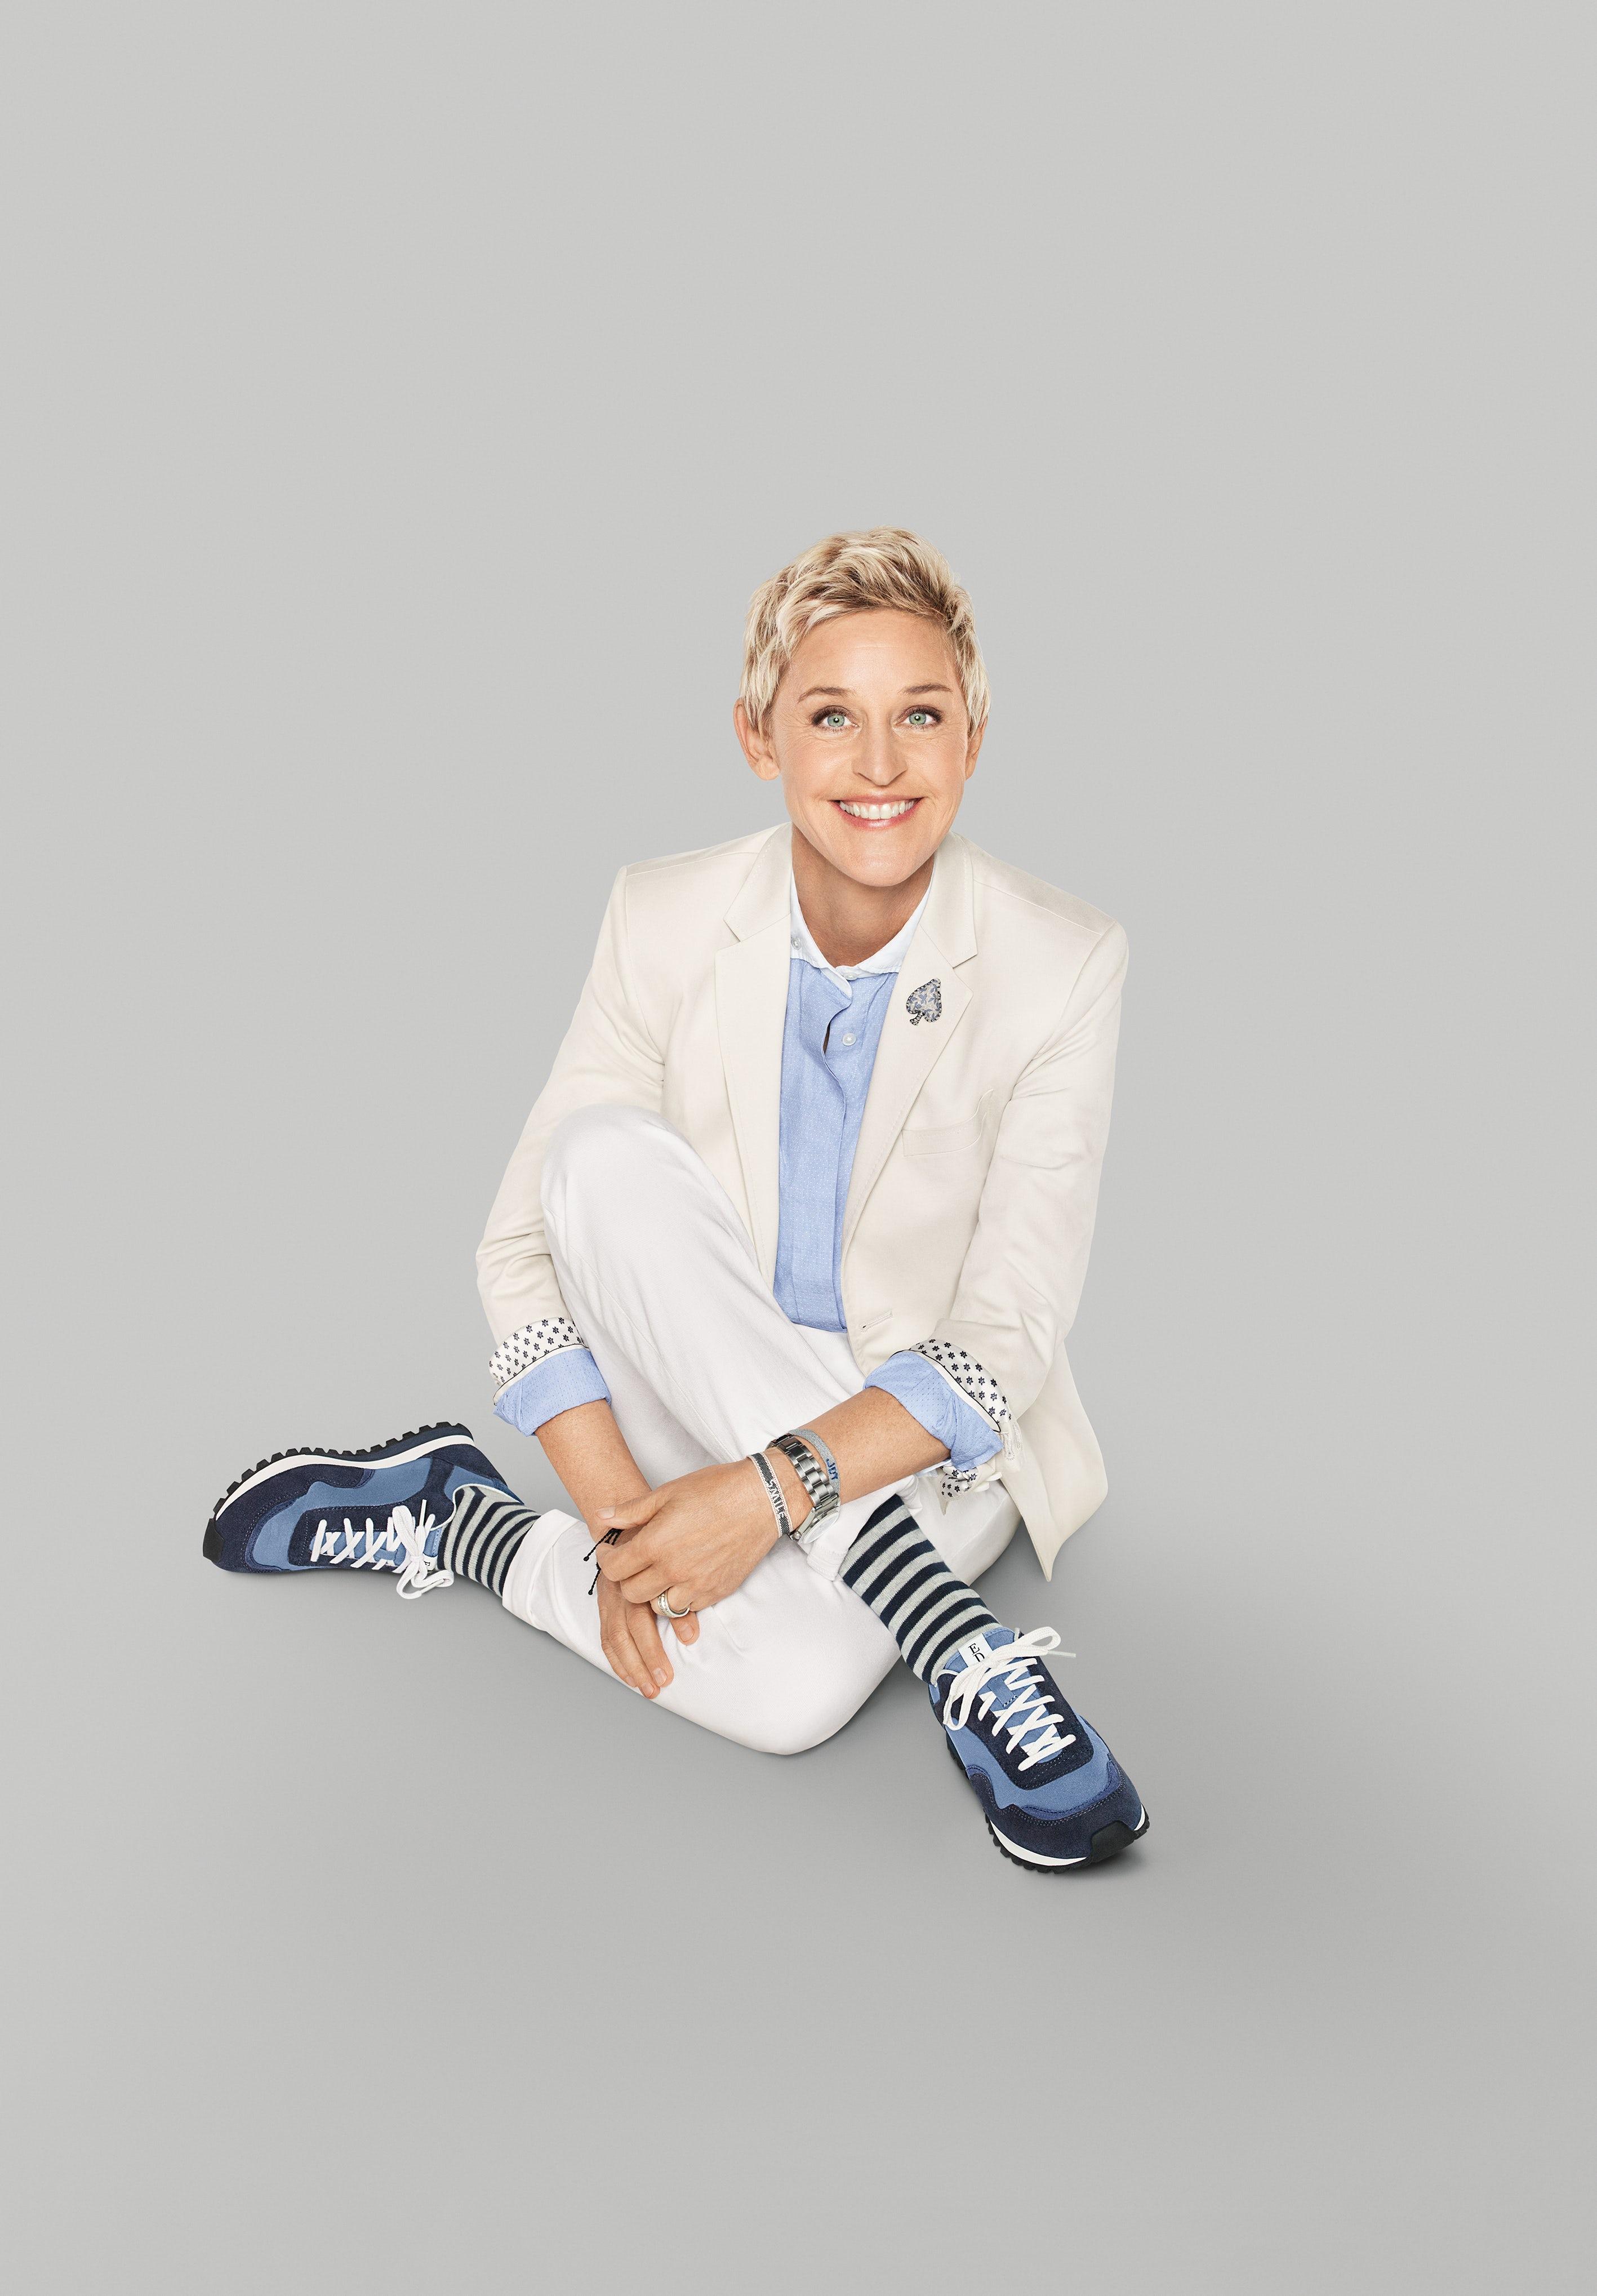 Ellen Degeneres | Photo: Doug Inglish for BoF